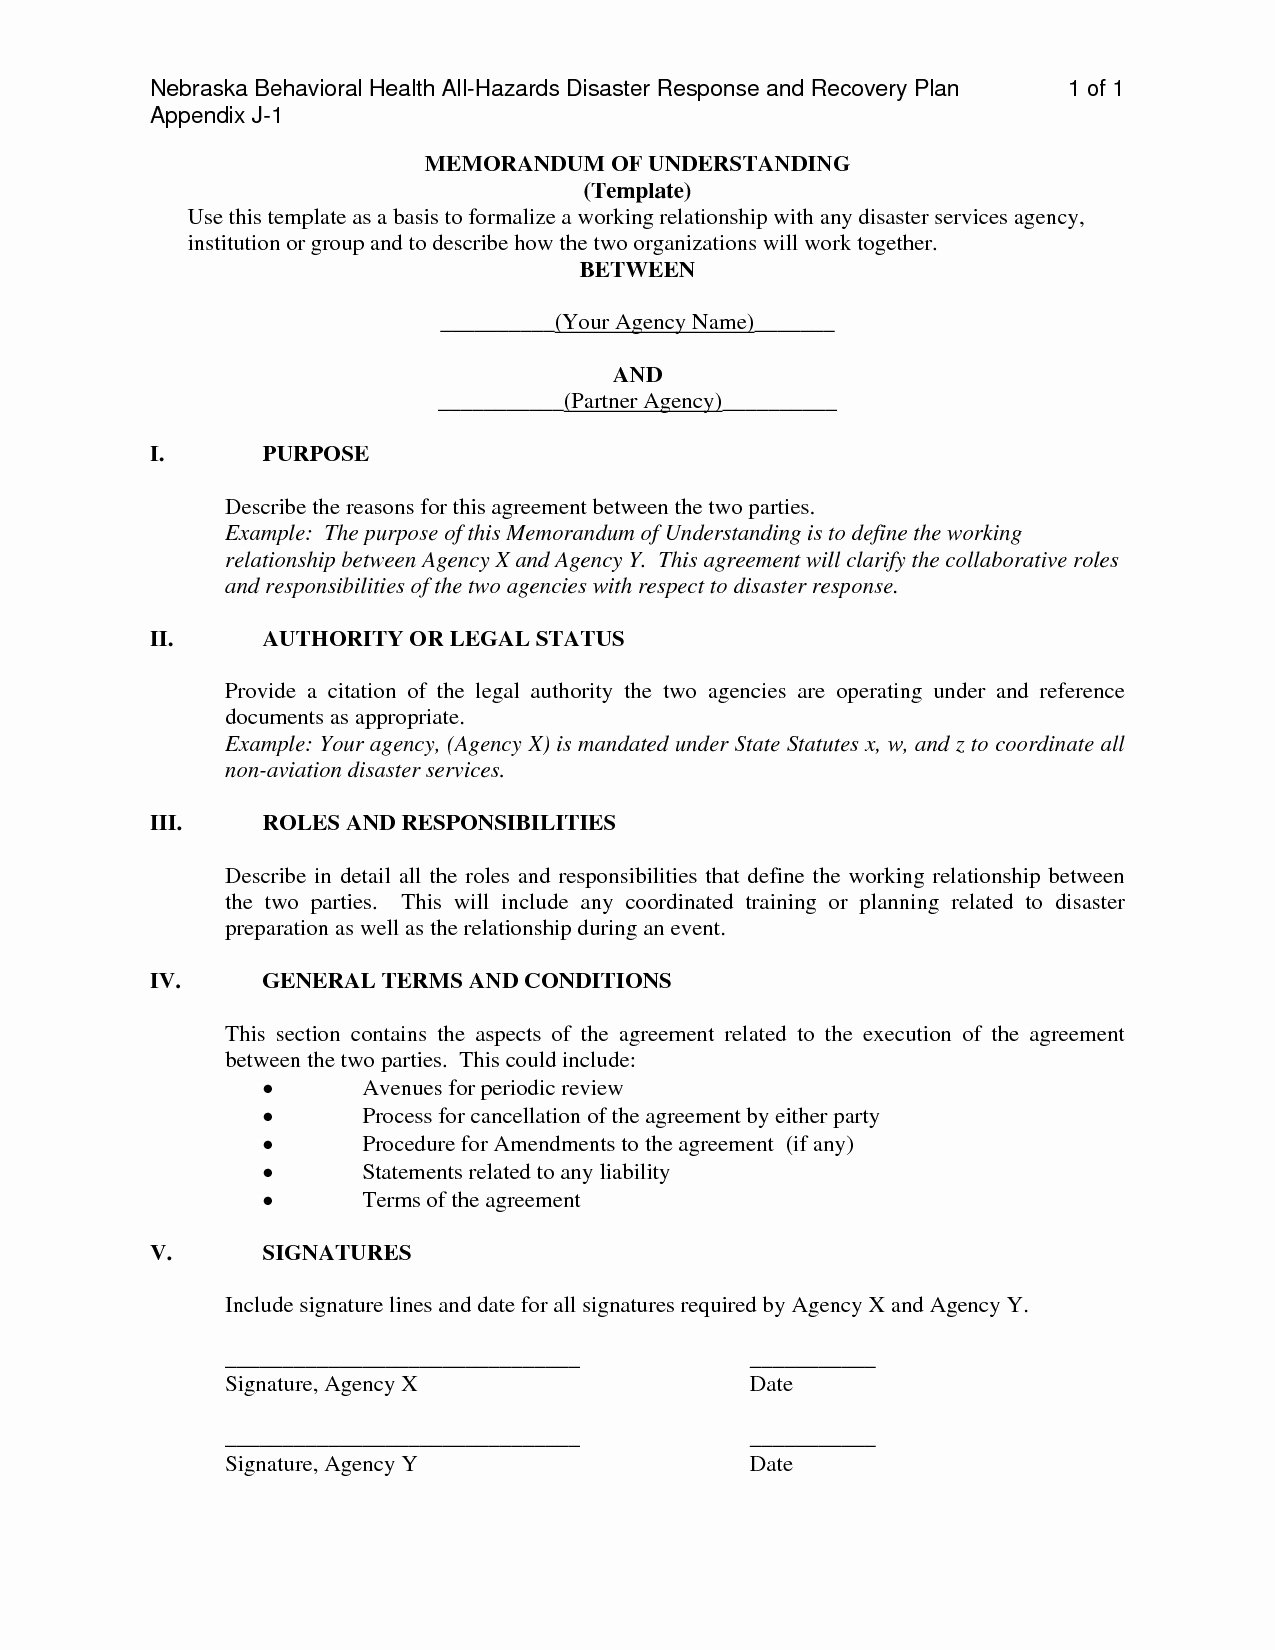 Memorandum Of Agreement Template Beautiful Memorandum Understanding Template